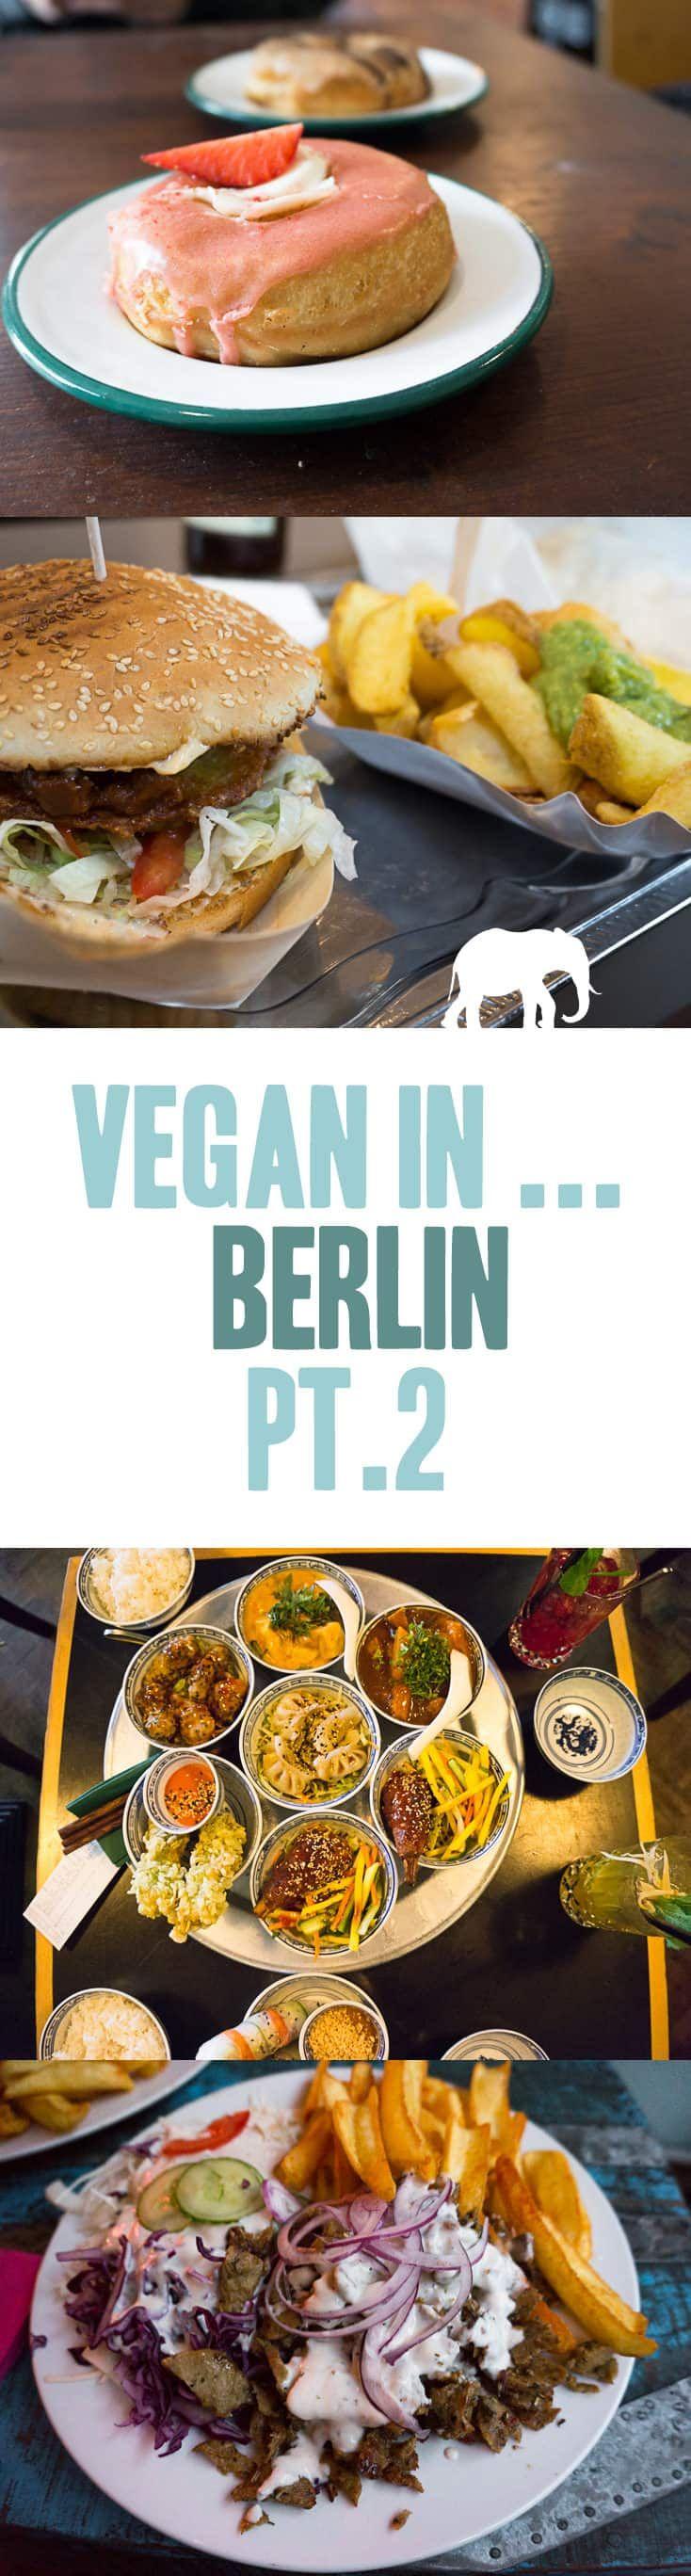 Vegan in Berlin, Germany Pt. 2 via @elephantasticv